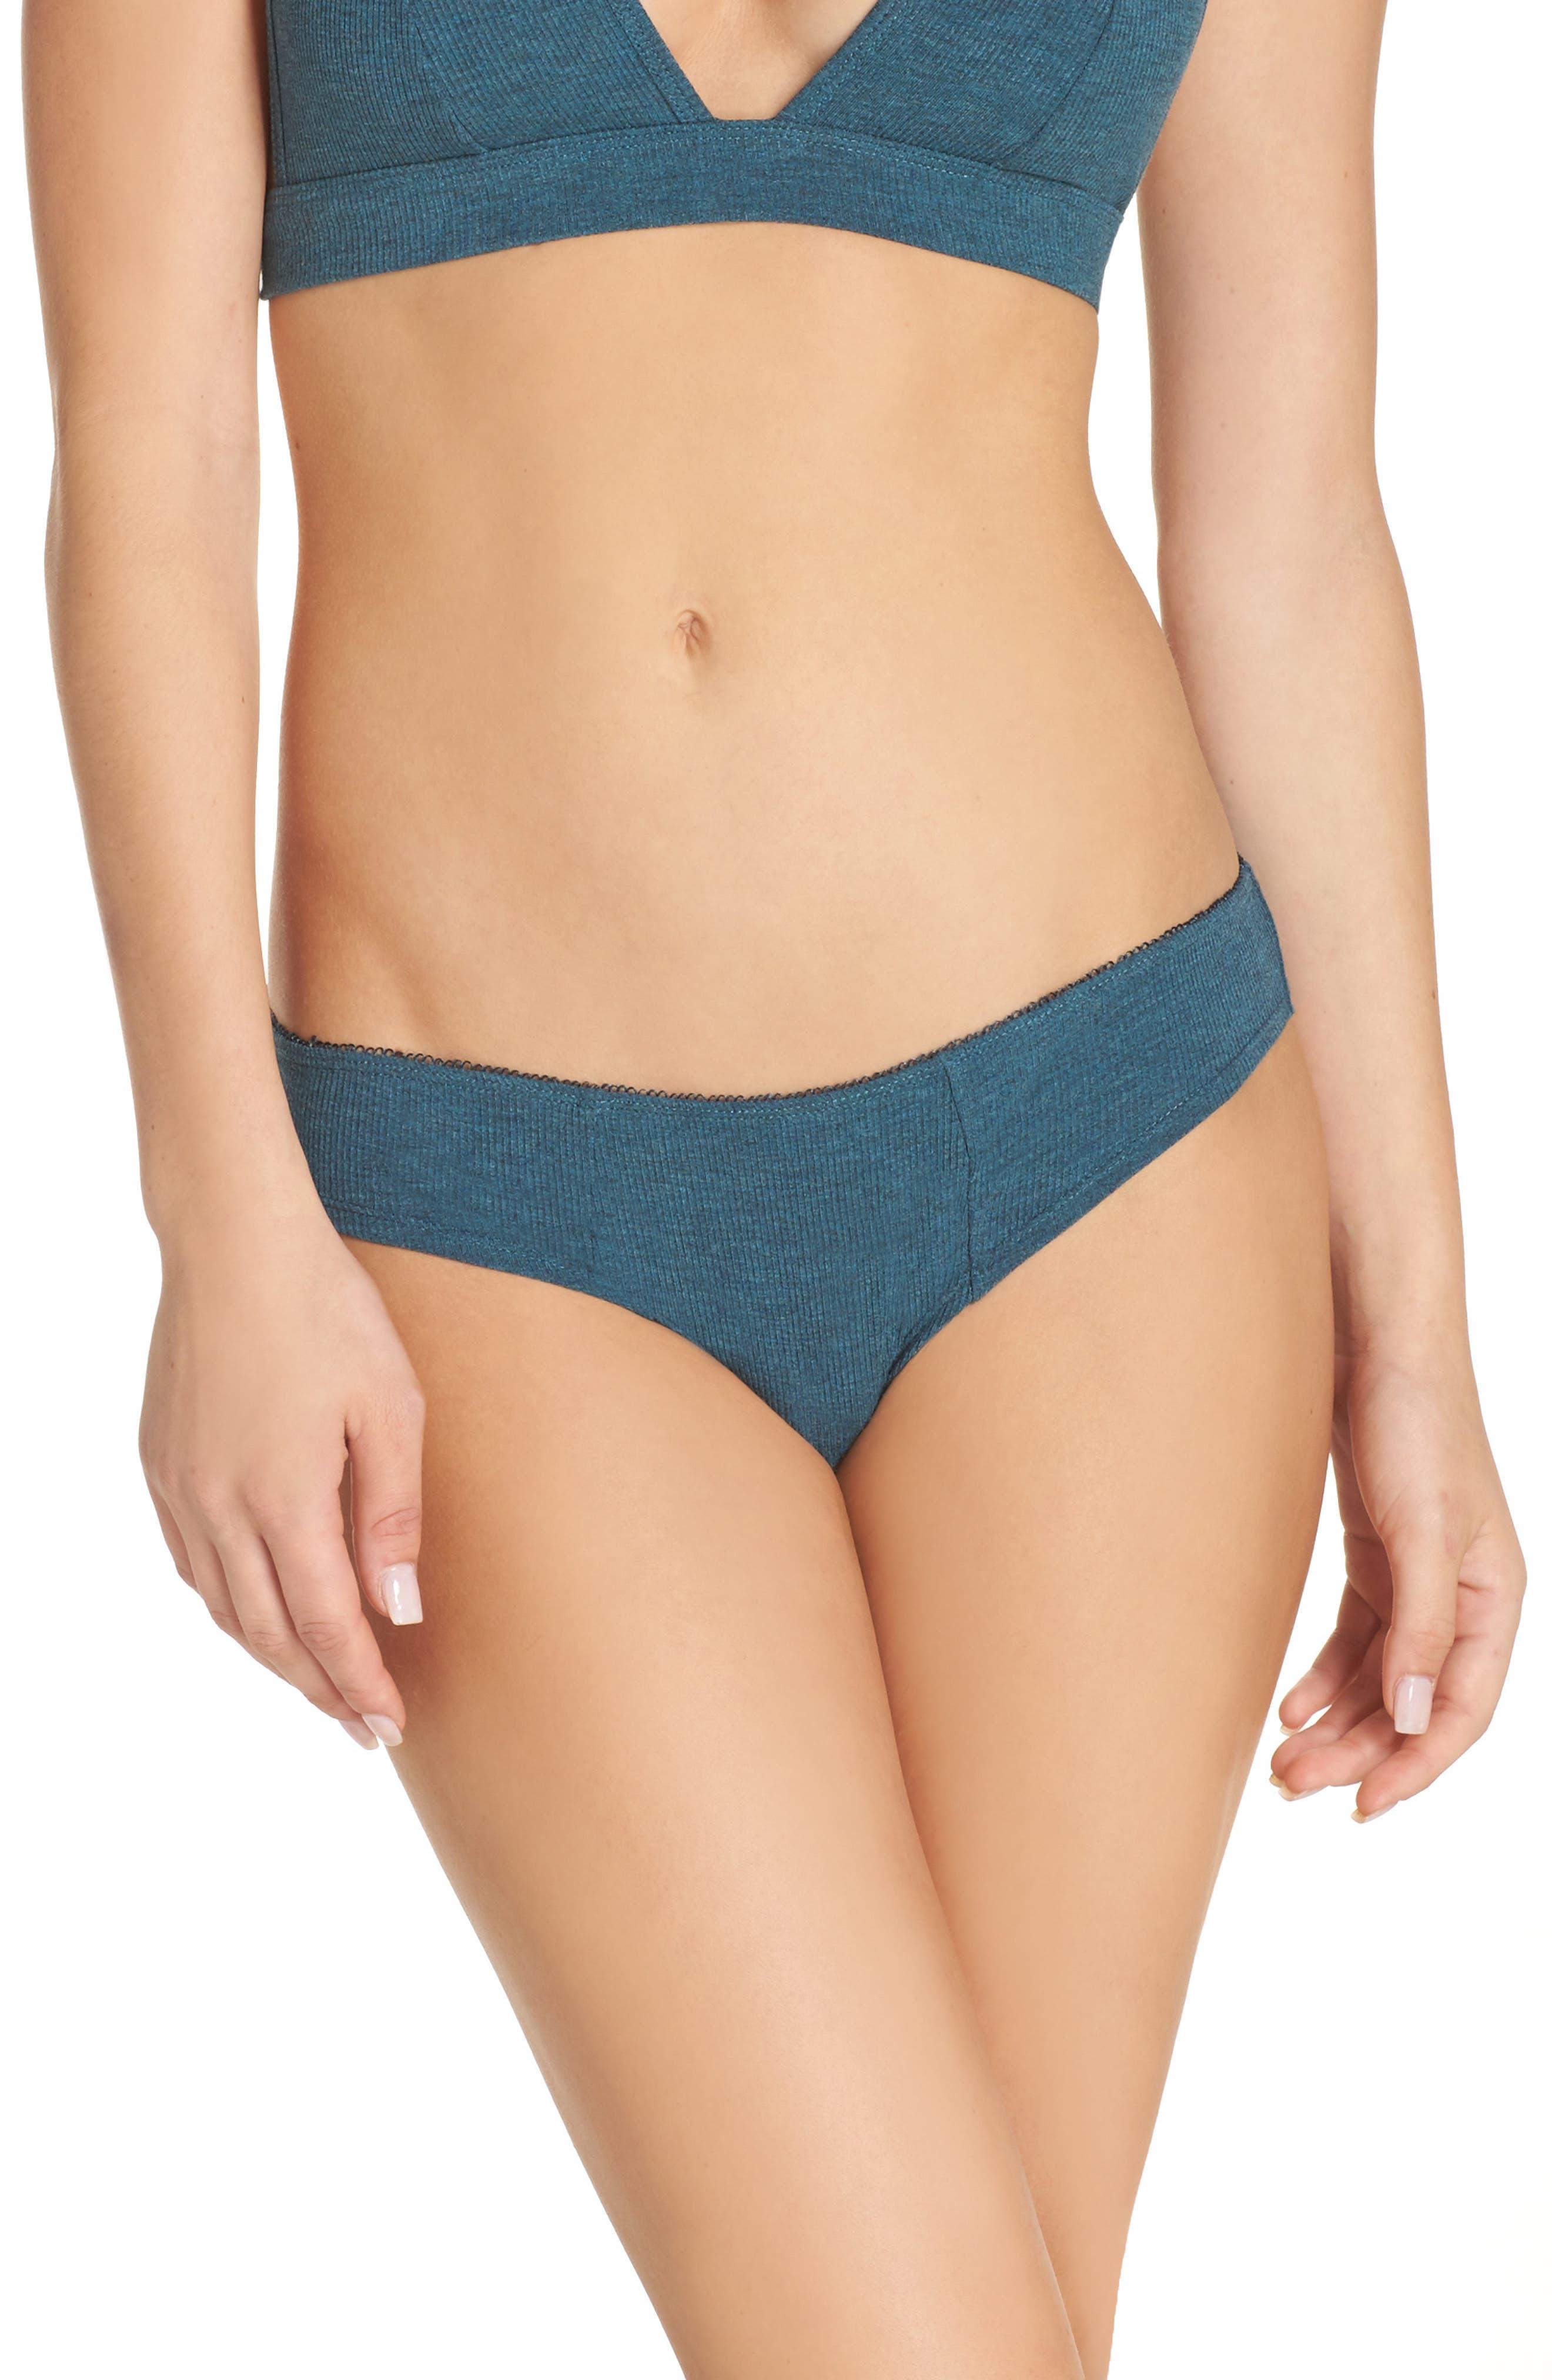 Rib Knit Bikini,                         Main,                         color, 317